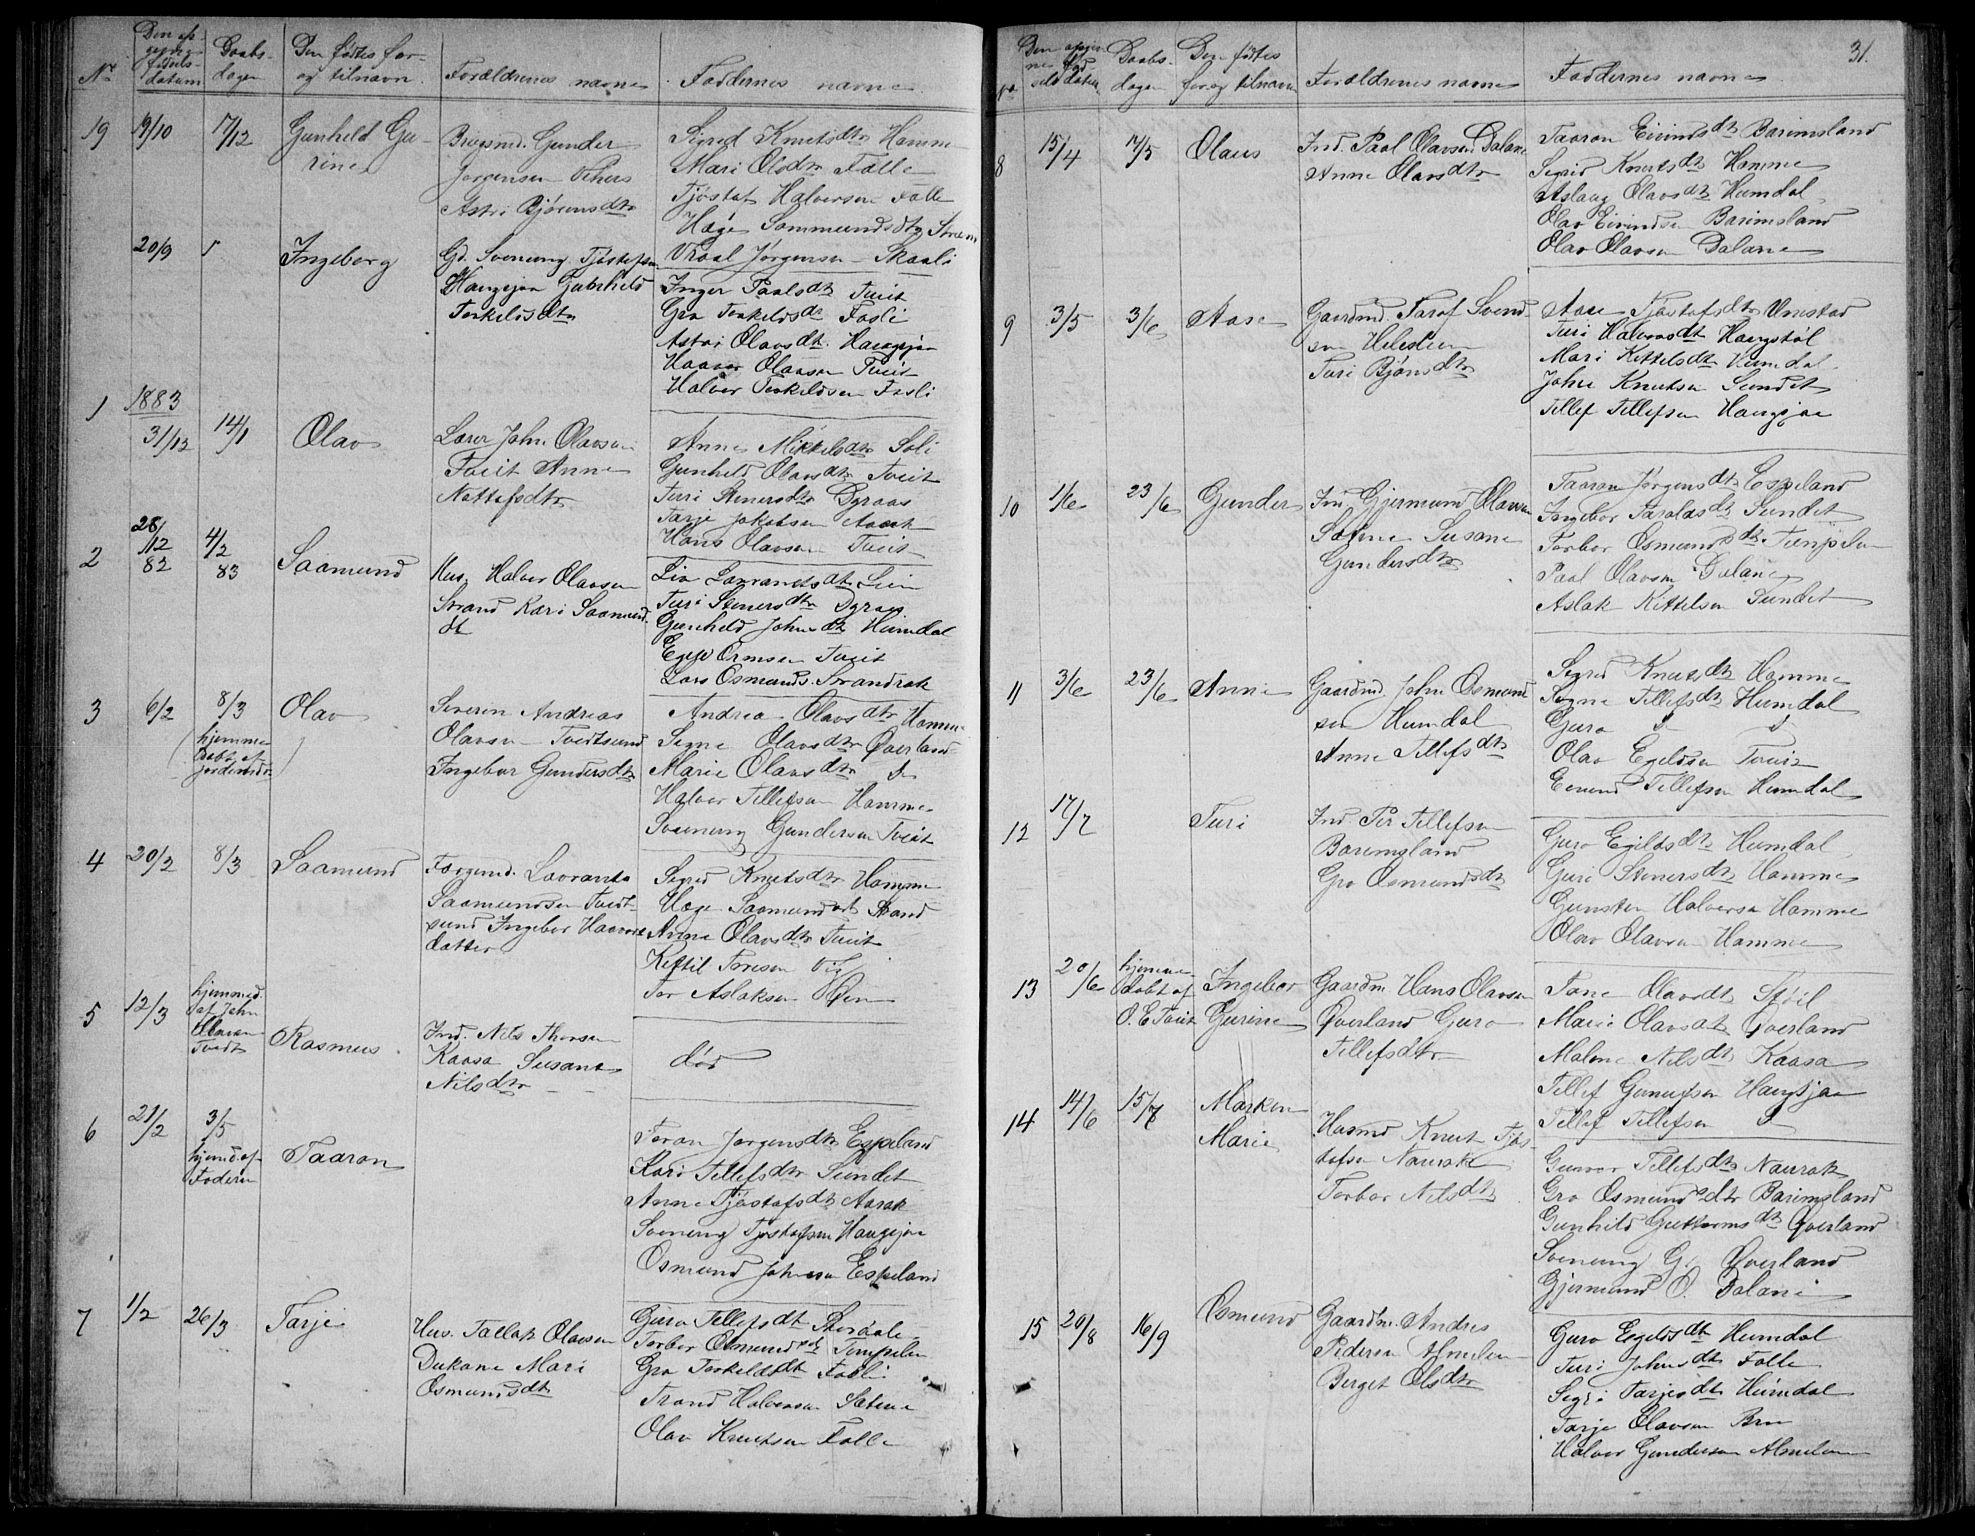 SAKO, Nissedal kirkebøker, G/Gb/L0002: Klokkerbok nr. II 2, 1863-1892, s. 31